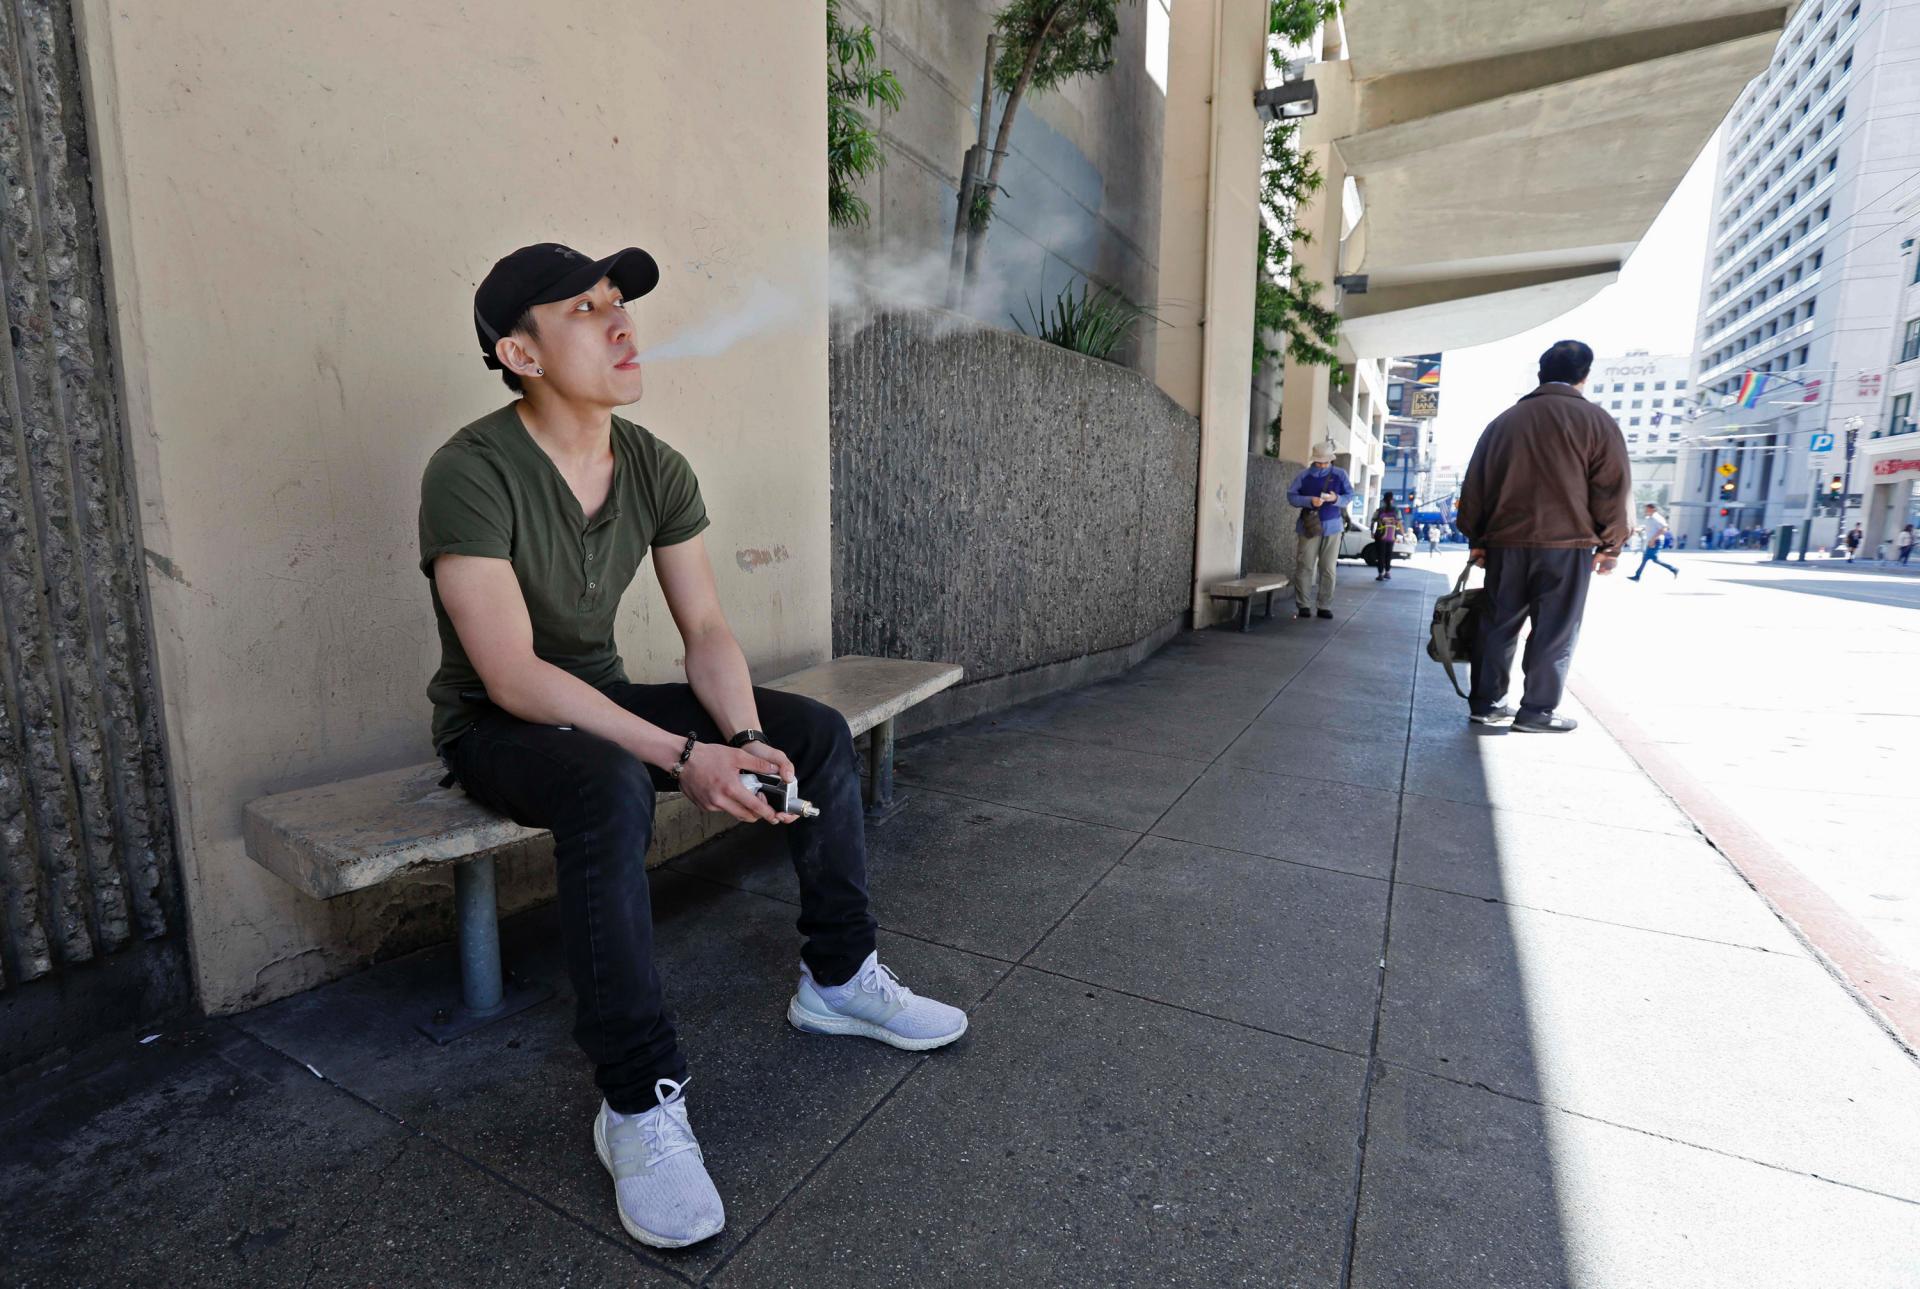 The Latest: San Francisco closer to ban on e-cigarette sales